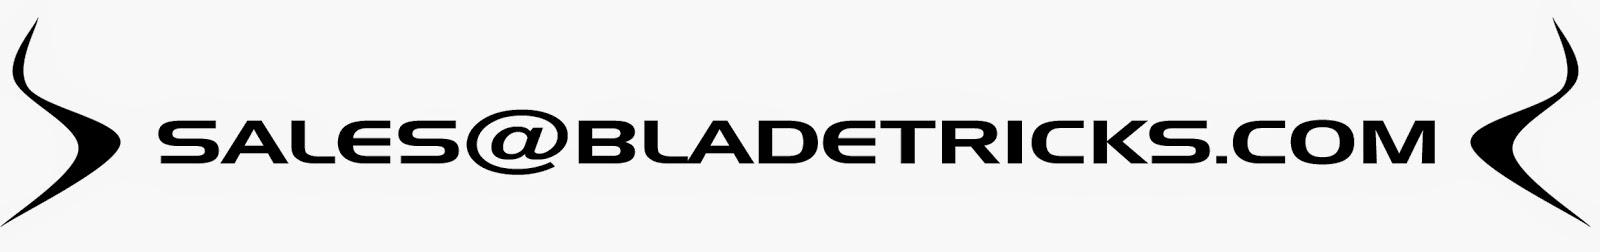 Contact Bladetriks via e-mail for custom knives karambits tomahawks and tools